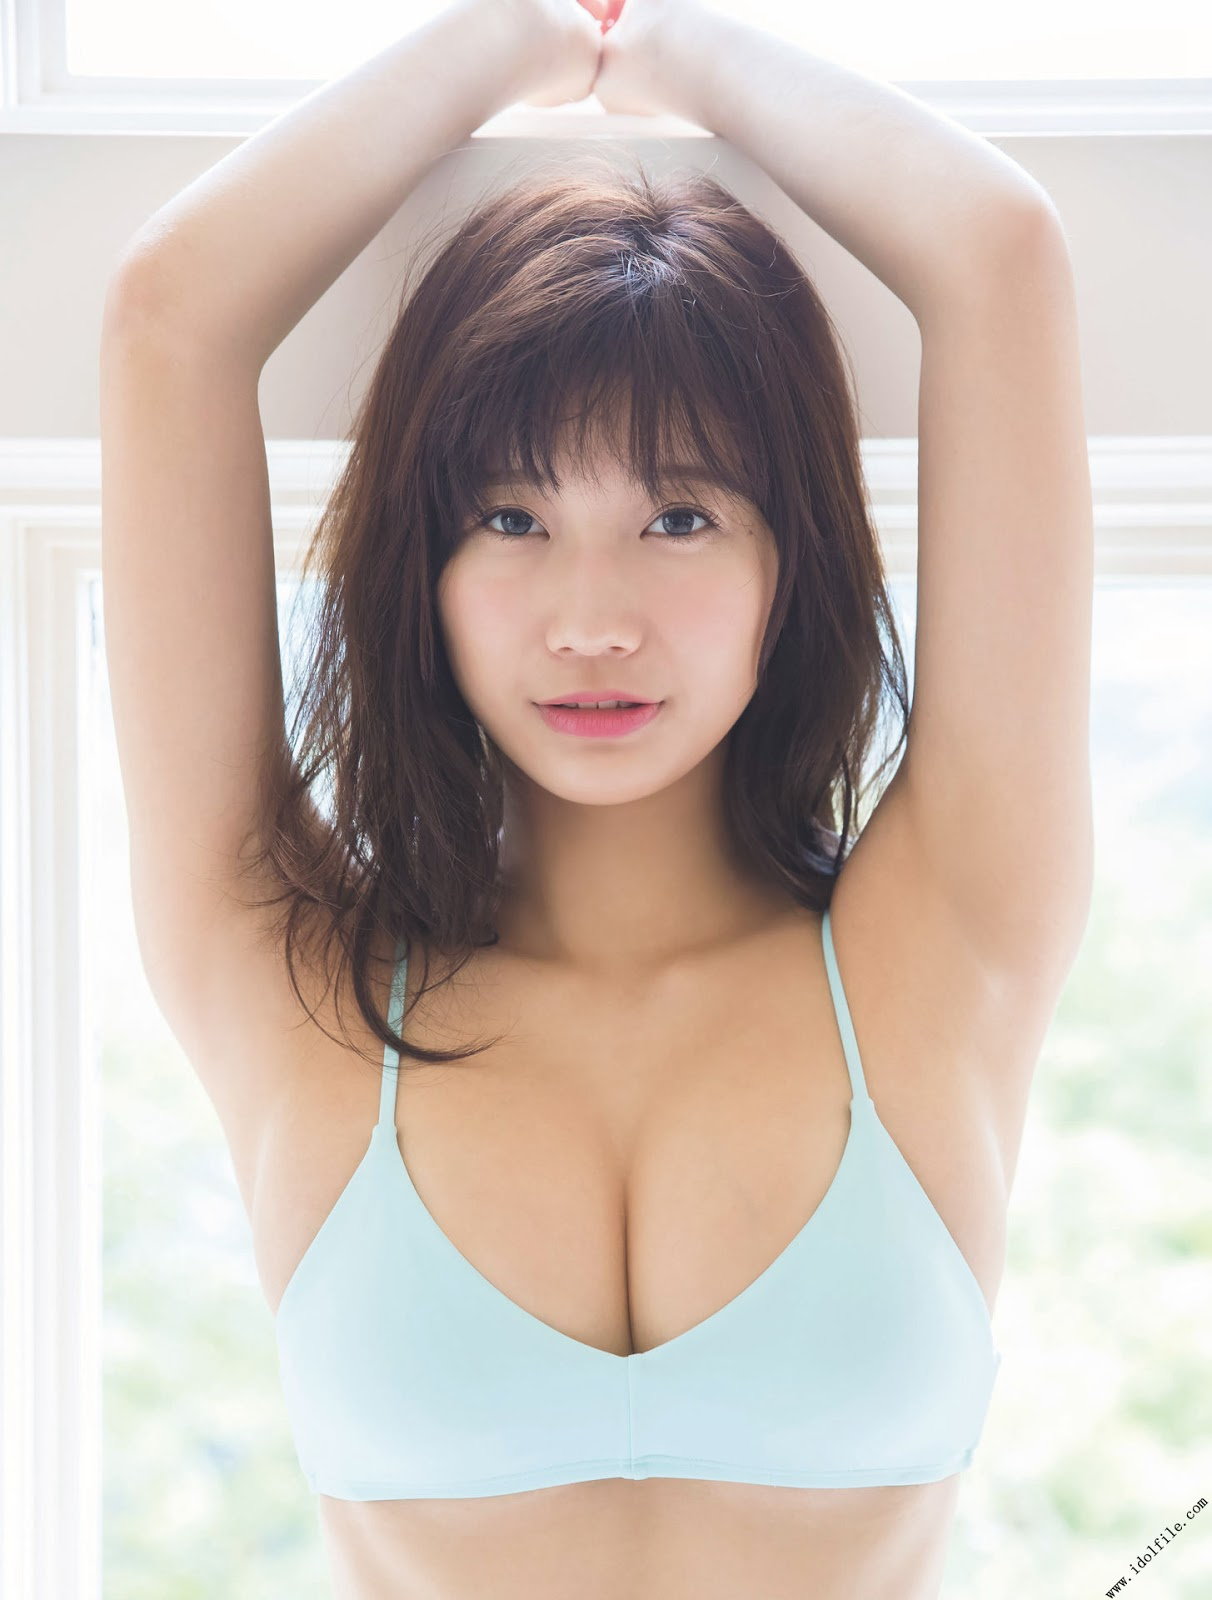 Yuka Ogura 小倉優香, Platinum FLASH 2017 Vol.01 (プラチナフラッシュ 2017 Vol.1) Part.02